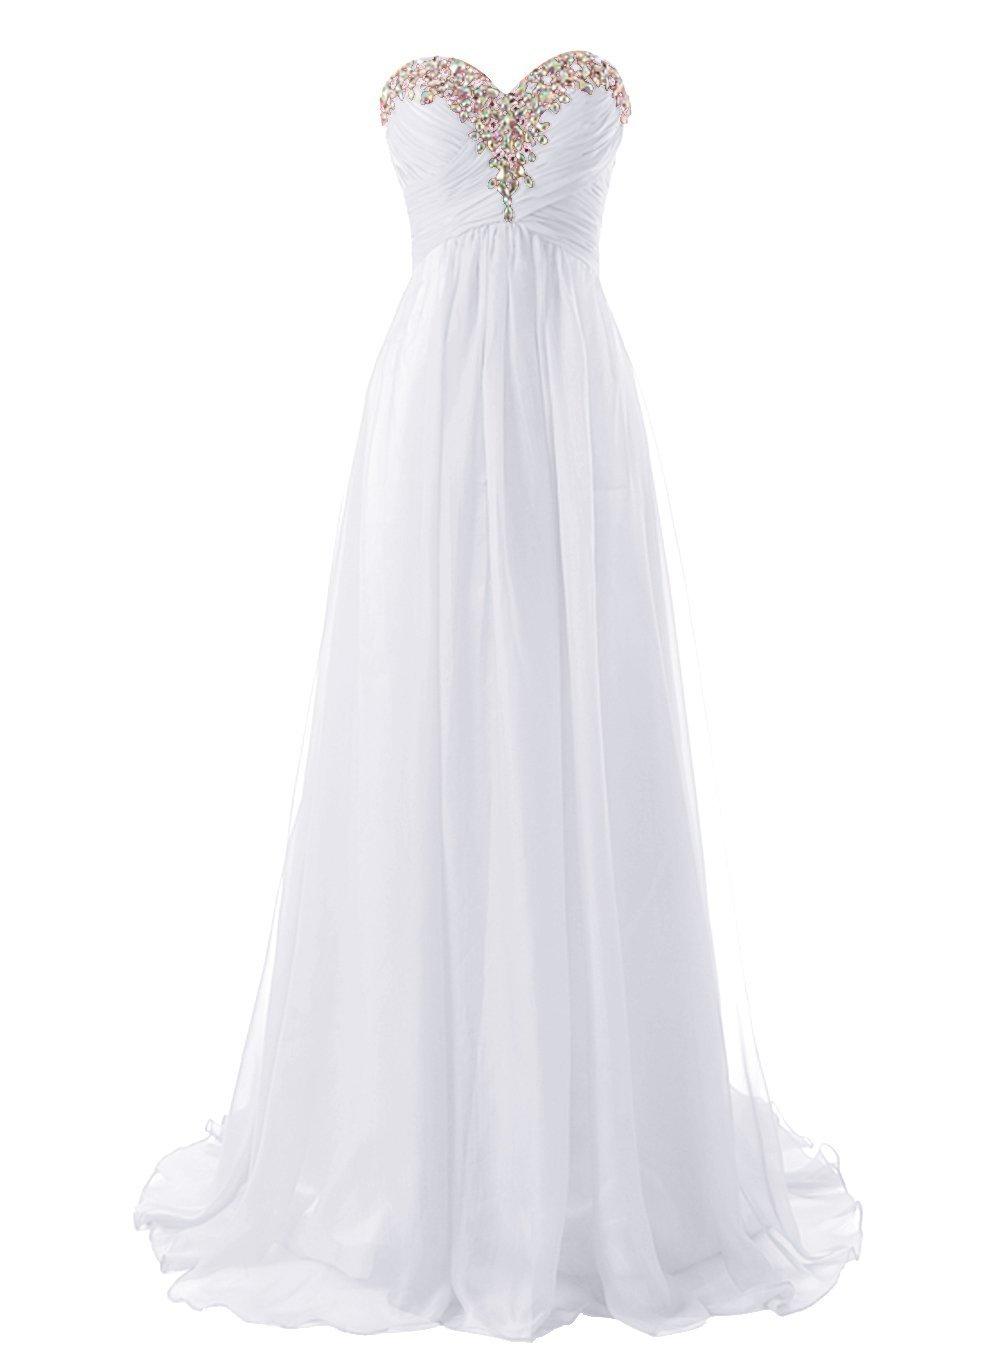 Snowskite Sweetheart Long Beaded Chiffon Bridesmaid Dress Evening Dress White 4